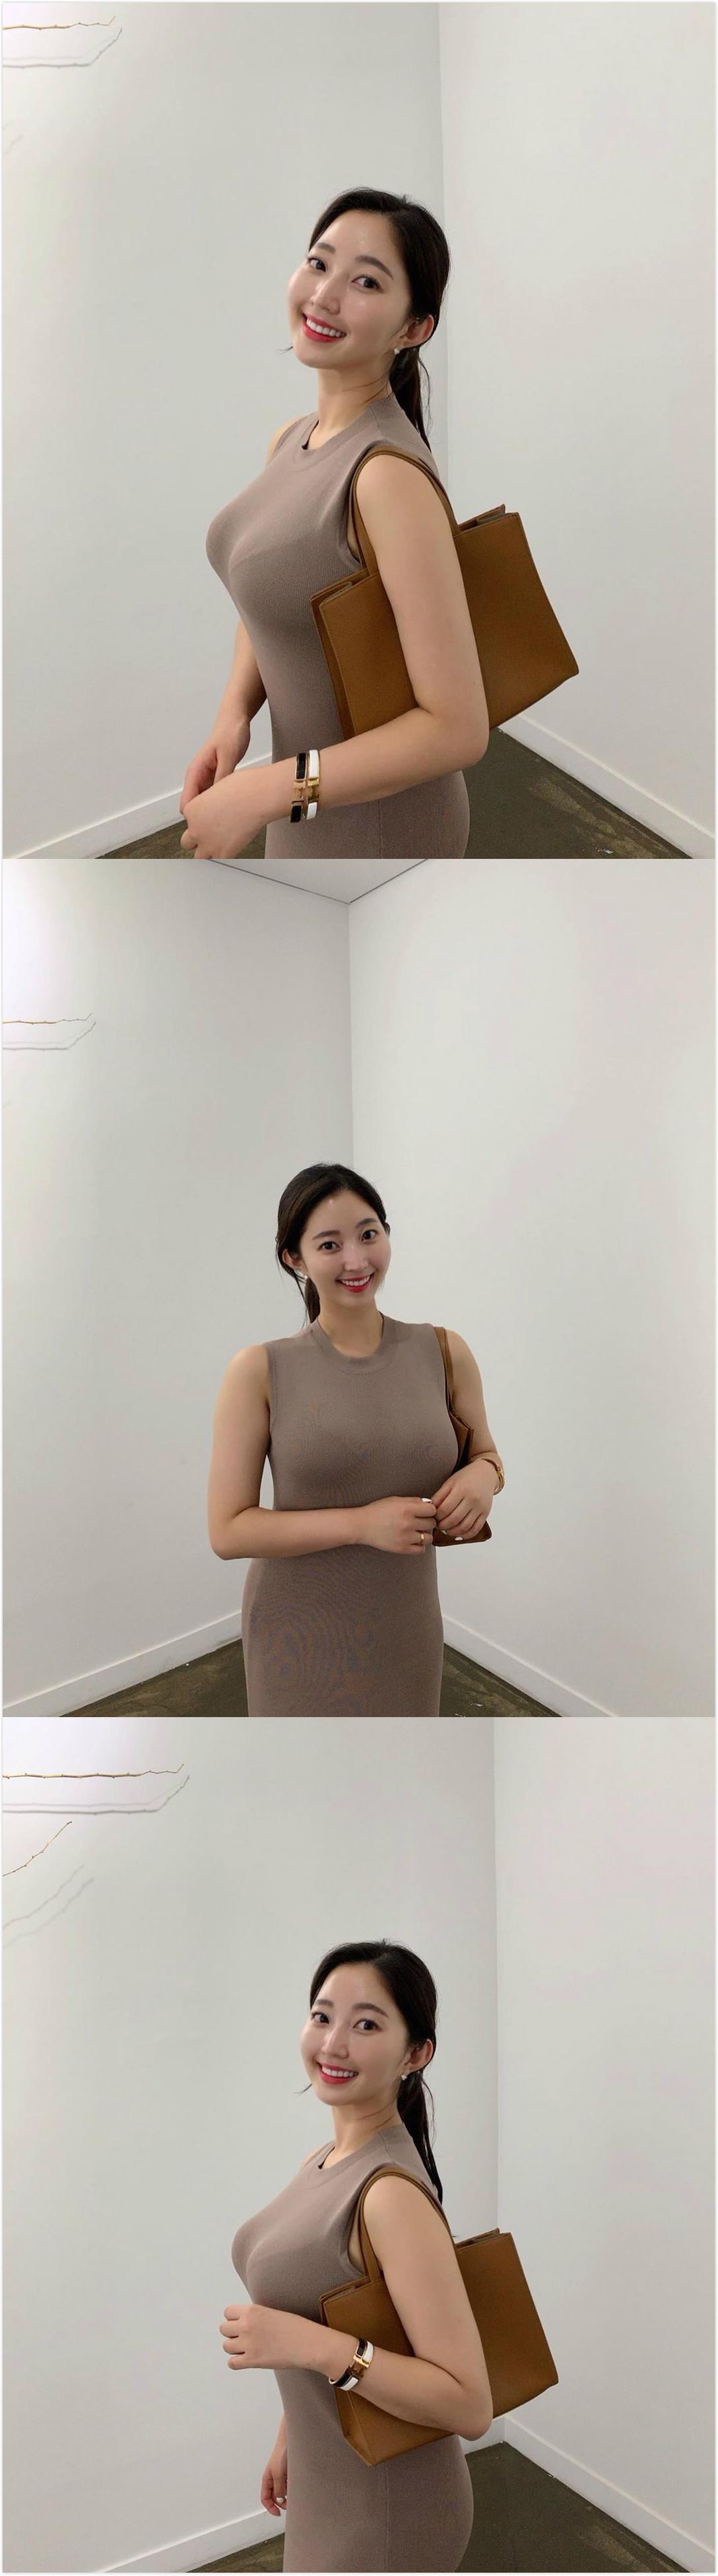 ins:parkssunwoo.com 我就喜欢微胖的女孩!